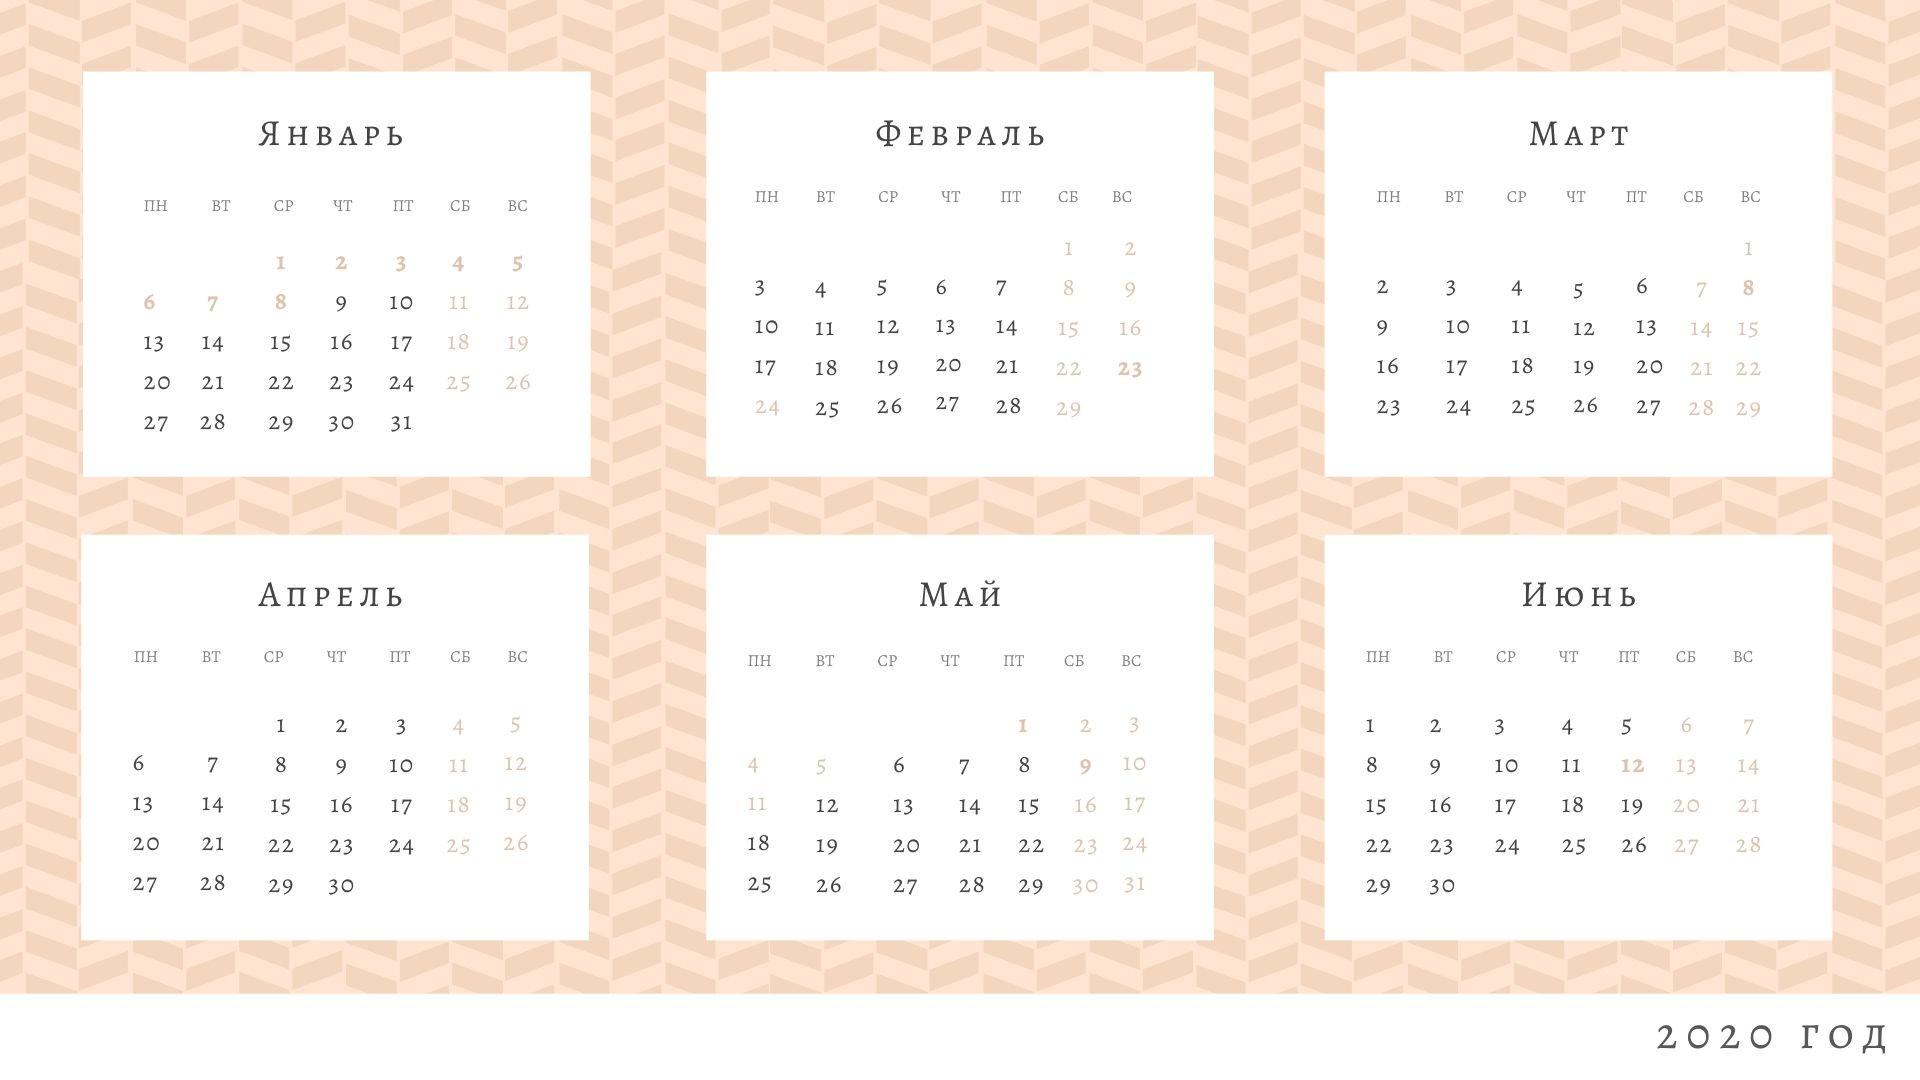 20 Календарей Для 2020 Года – Шаблоны И Идеи – Блог Canva with regard to Calendar 2020 Kuda